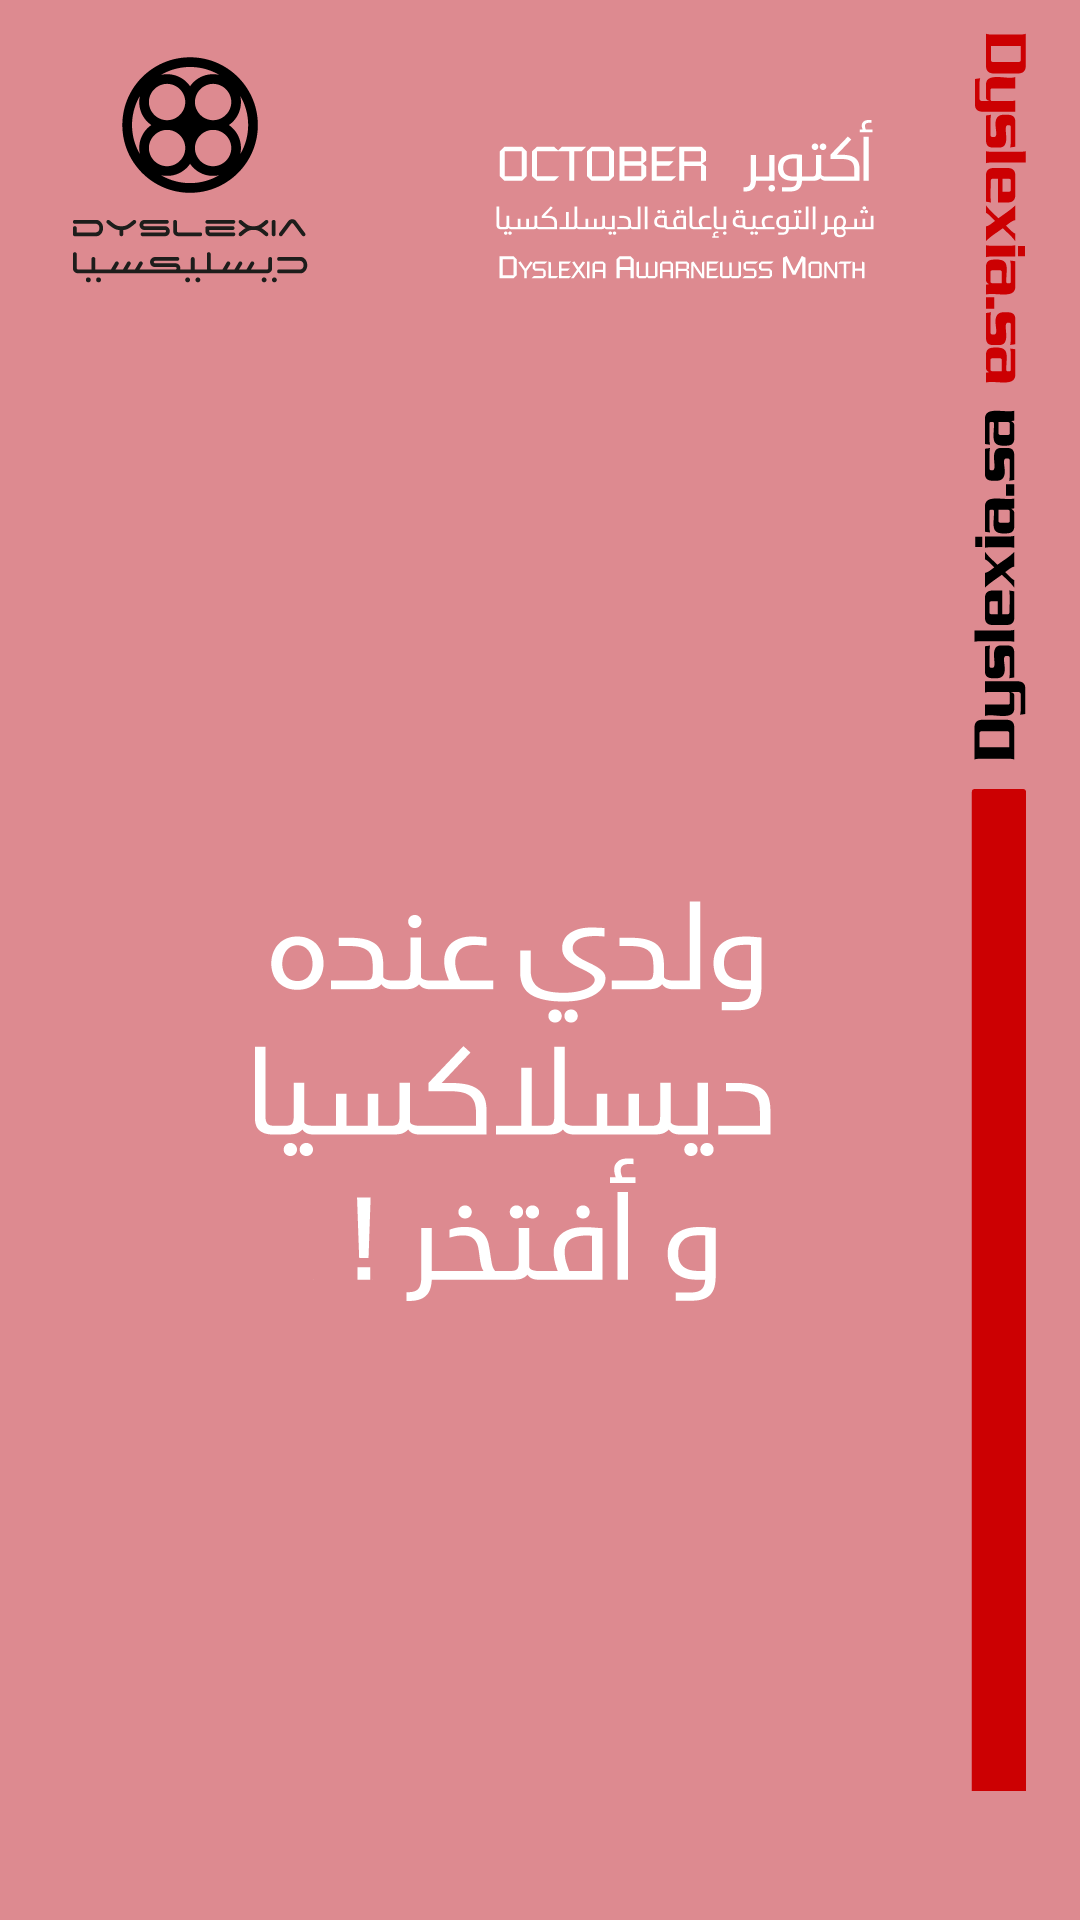 dyslexia-geofilter-may-3rd5